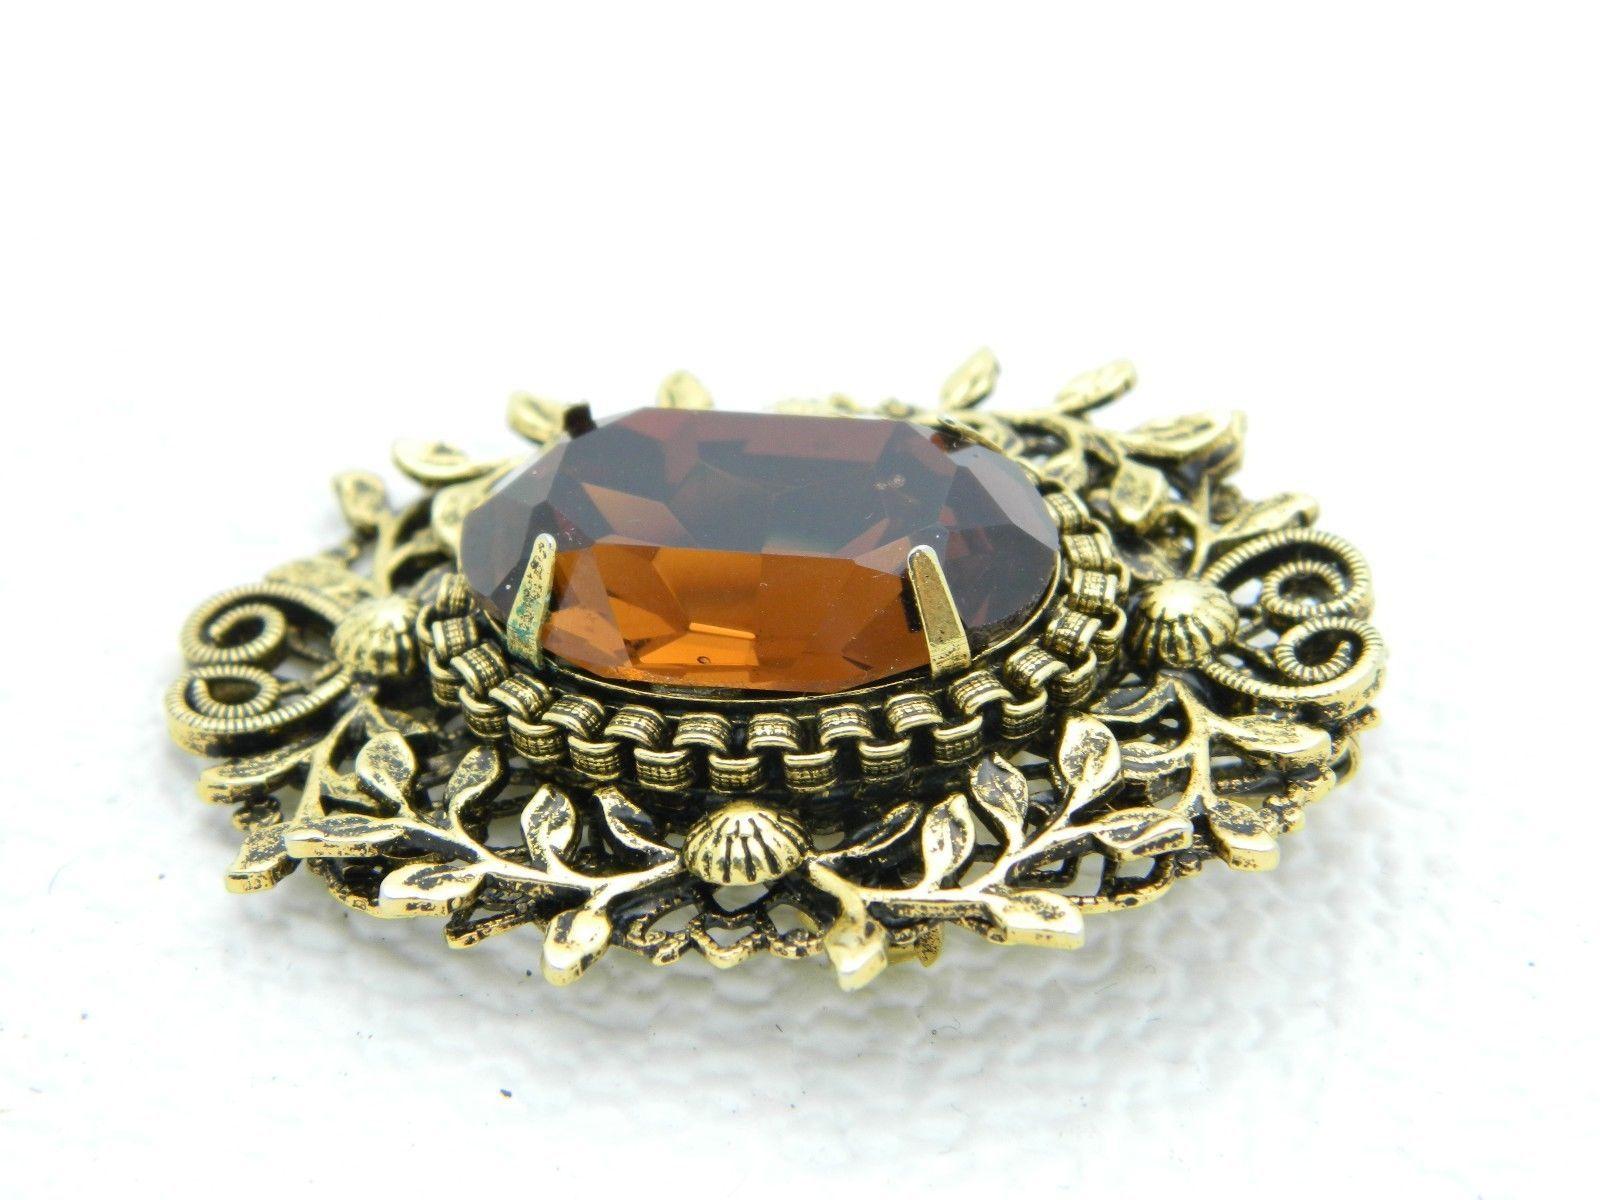 VTG Gold Tone Floral Filigree Topaz Glass Rhinestone Flower Pin Brooch Pendant